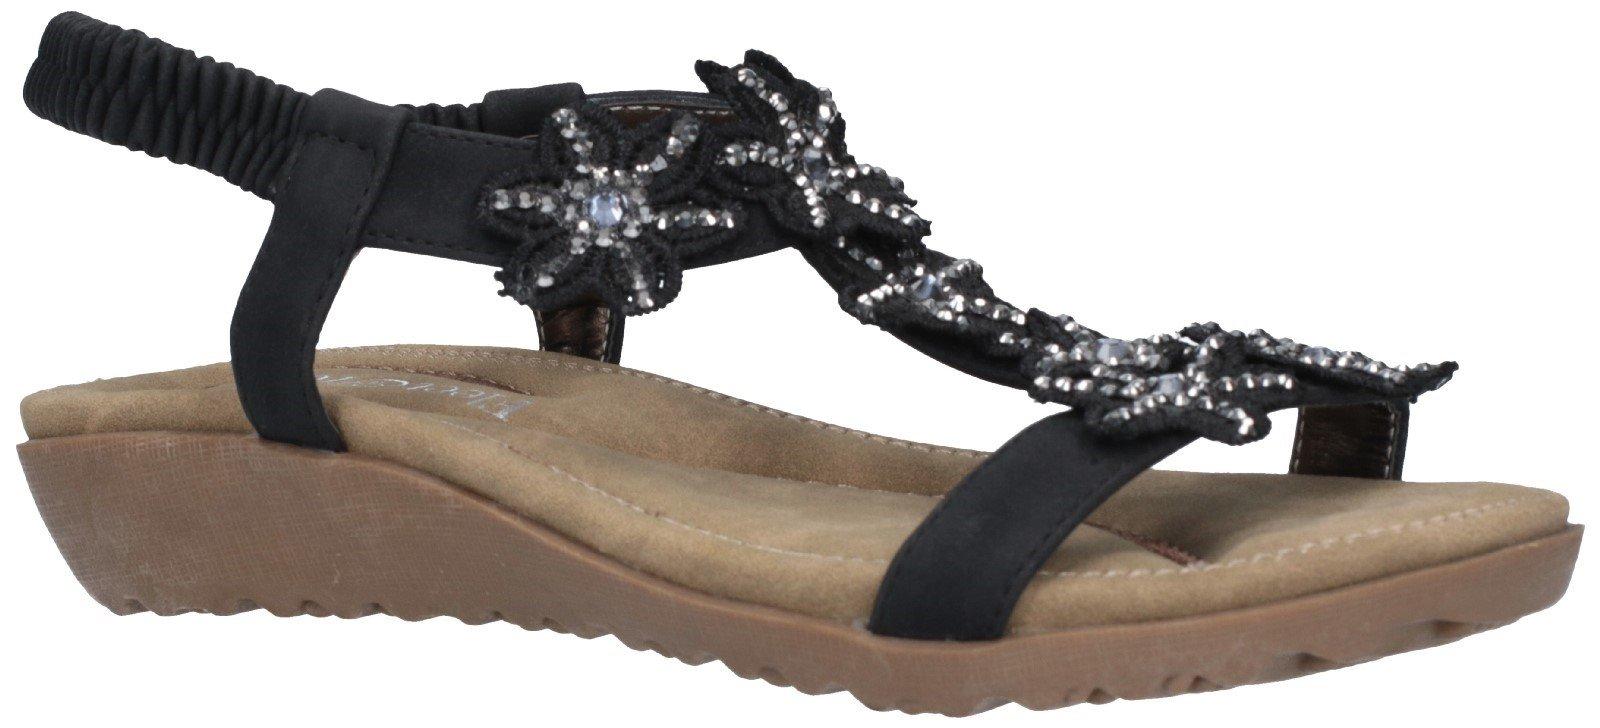 Fleet & Foster Women's Magnolia Elastic Sandal Various Colours 28279 - Black 3